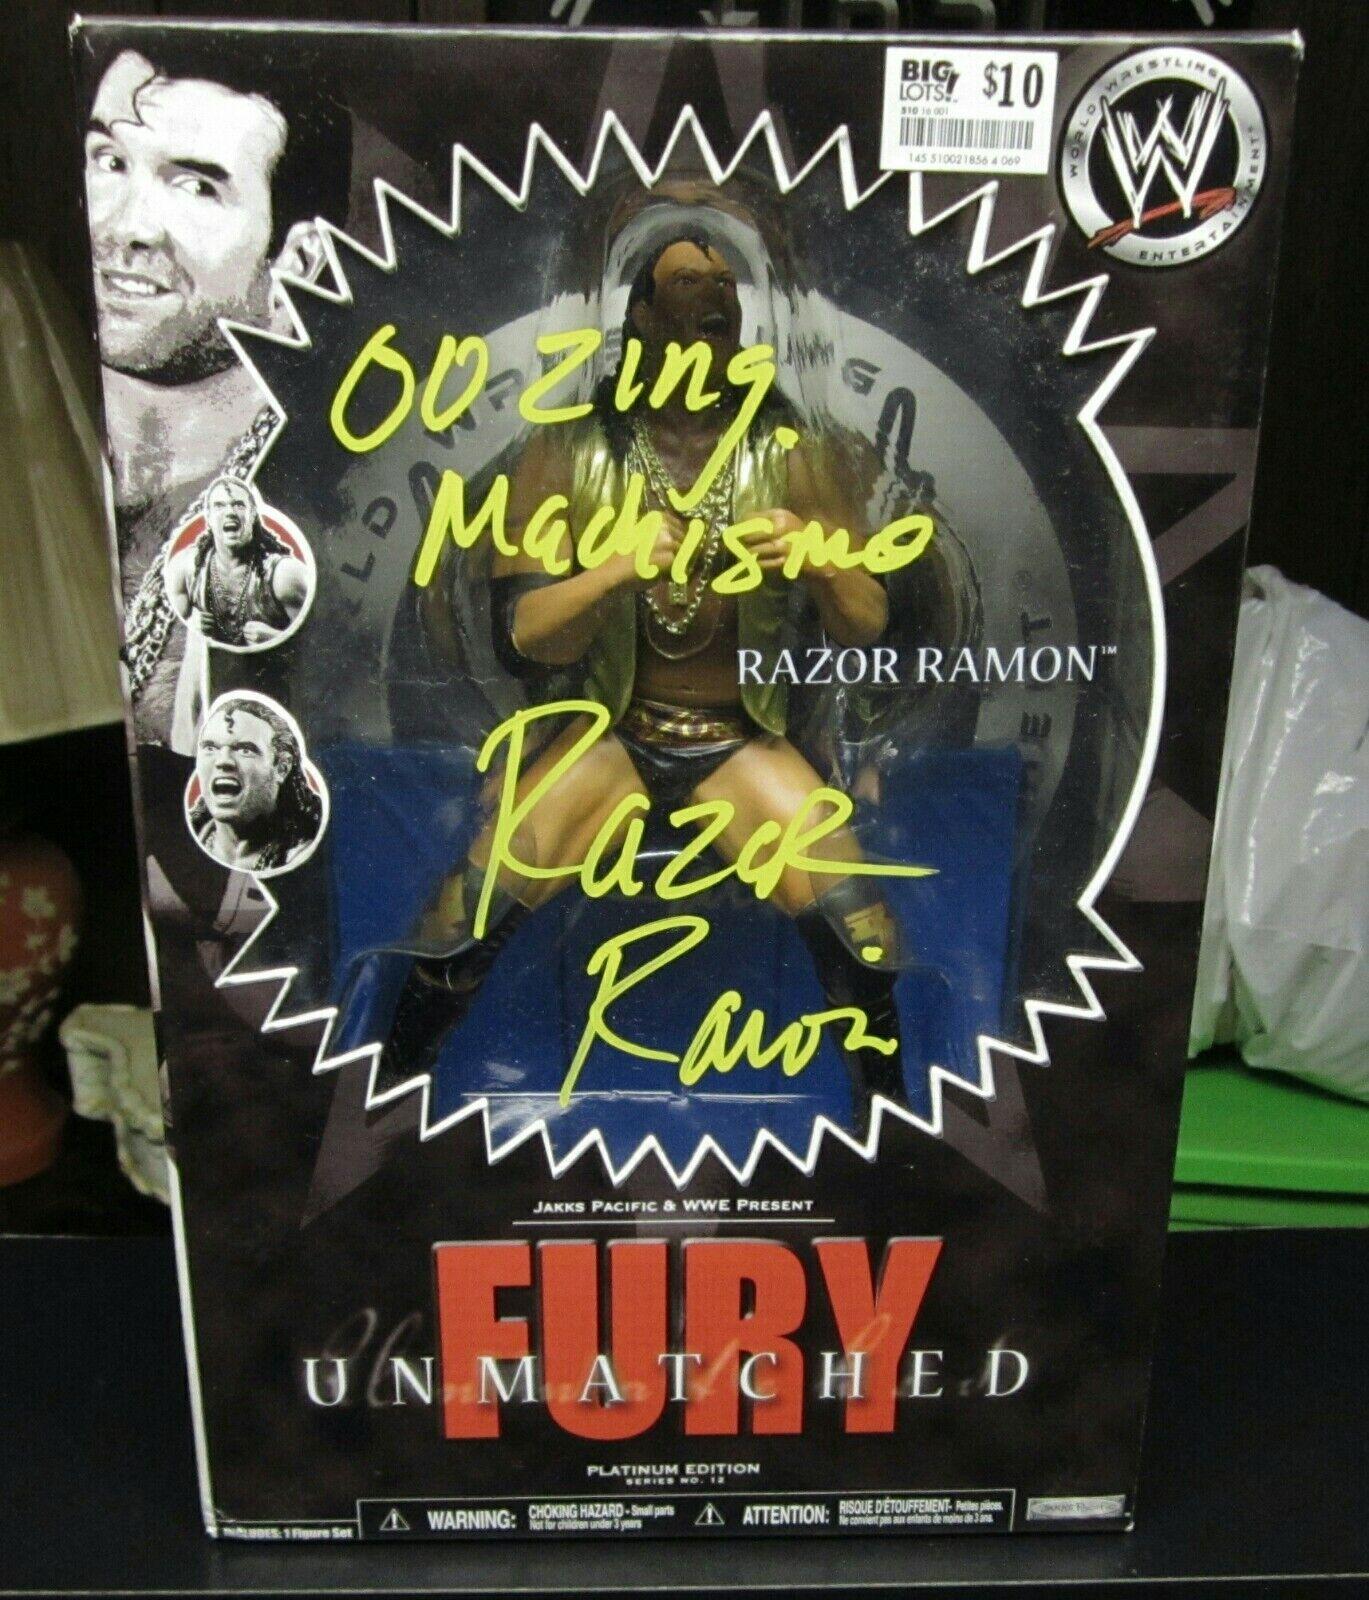 WWE UNMATCHED FURY RAZOR RAZOR RAZOR RAMON AUTOGRAPHED SIGNED cifra WWF NWO HOF WCW JAKKS 6364bf